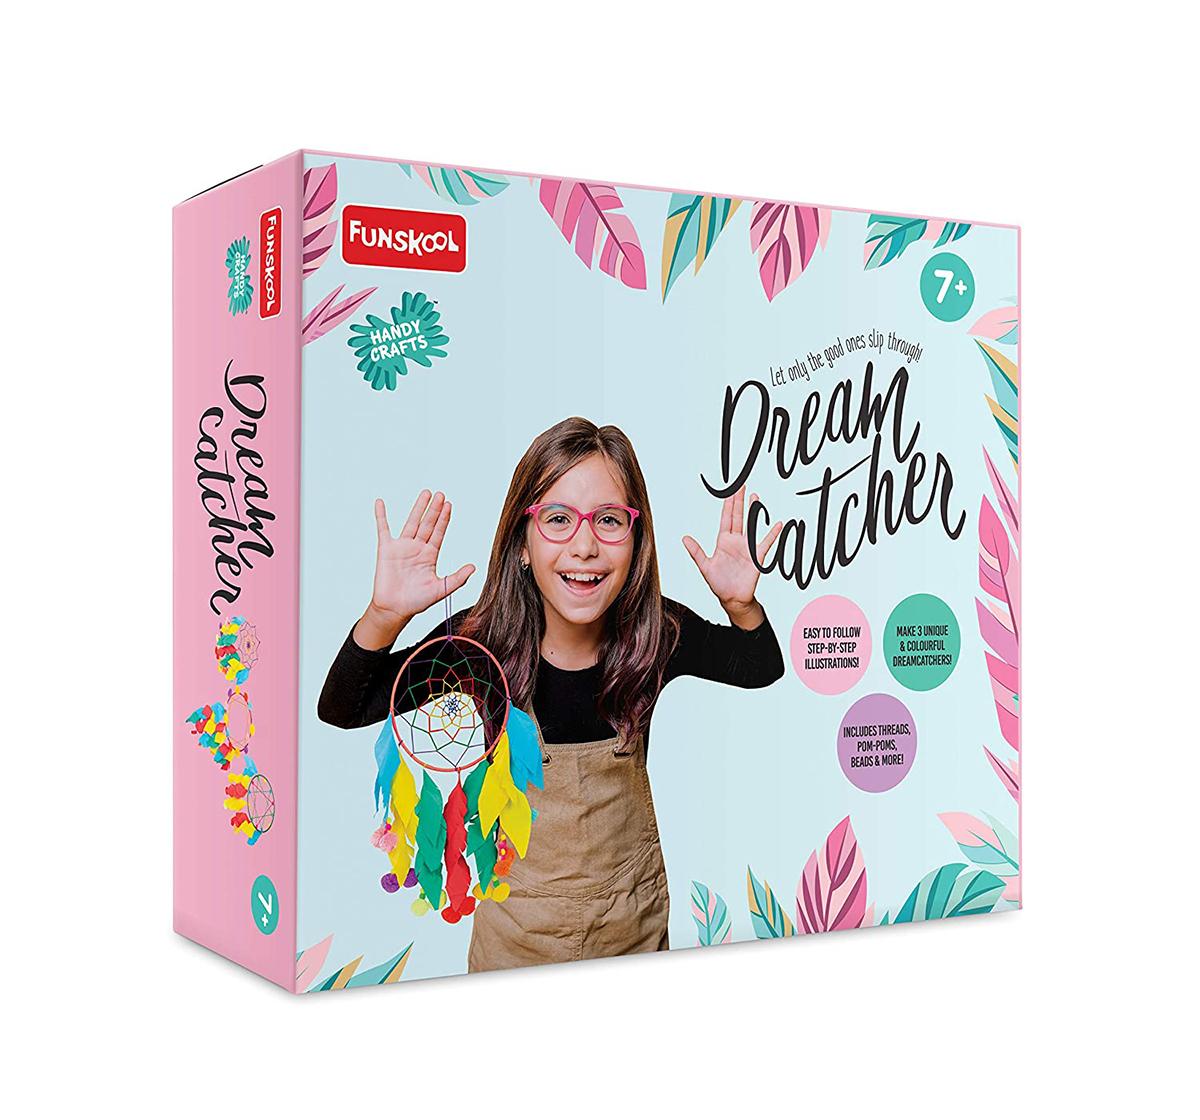 Funskool | Funskool - Handycrafts Dreamcatcher DIY Art & Craft Kits for Girls age 7Y+